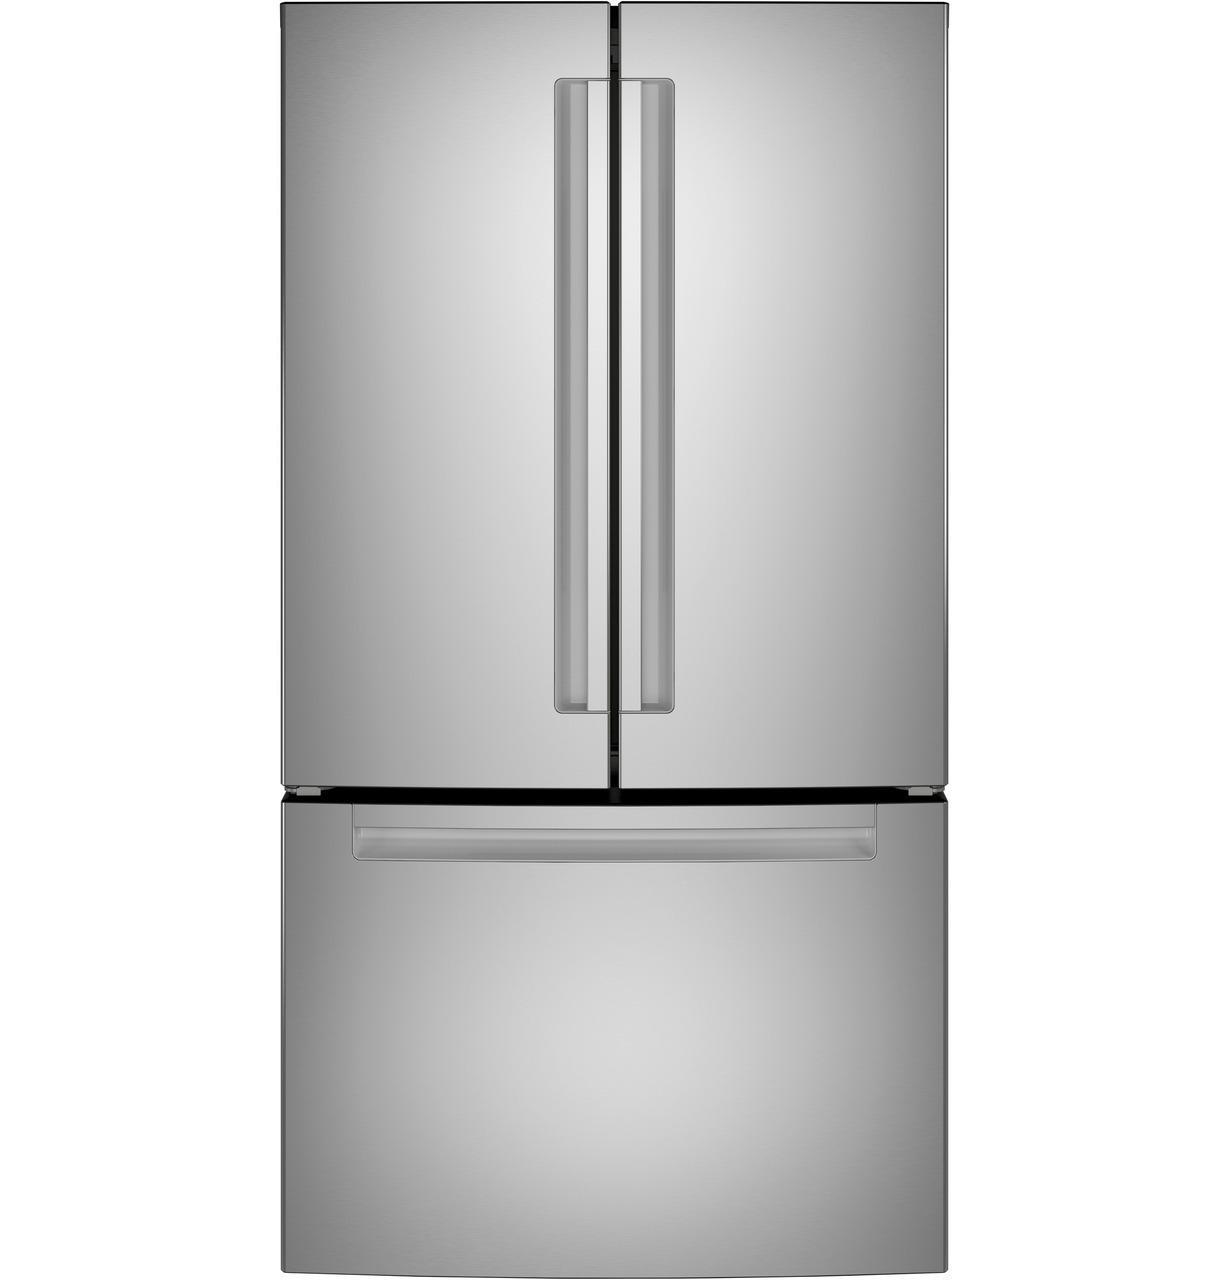 HaierEnergy Star® 27.0 Cu. Ft. Fingerprint Resistant French-Door Refrigerator